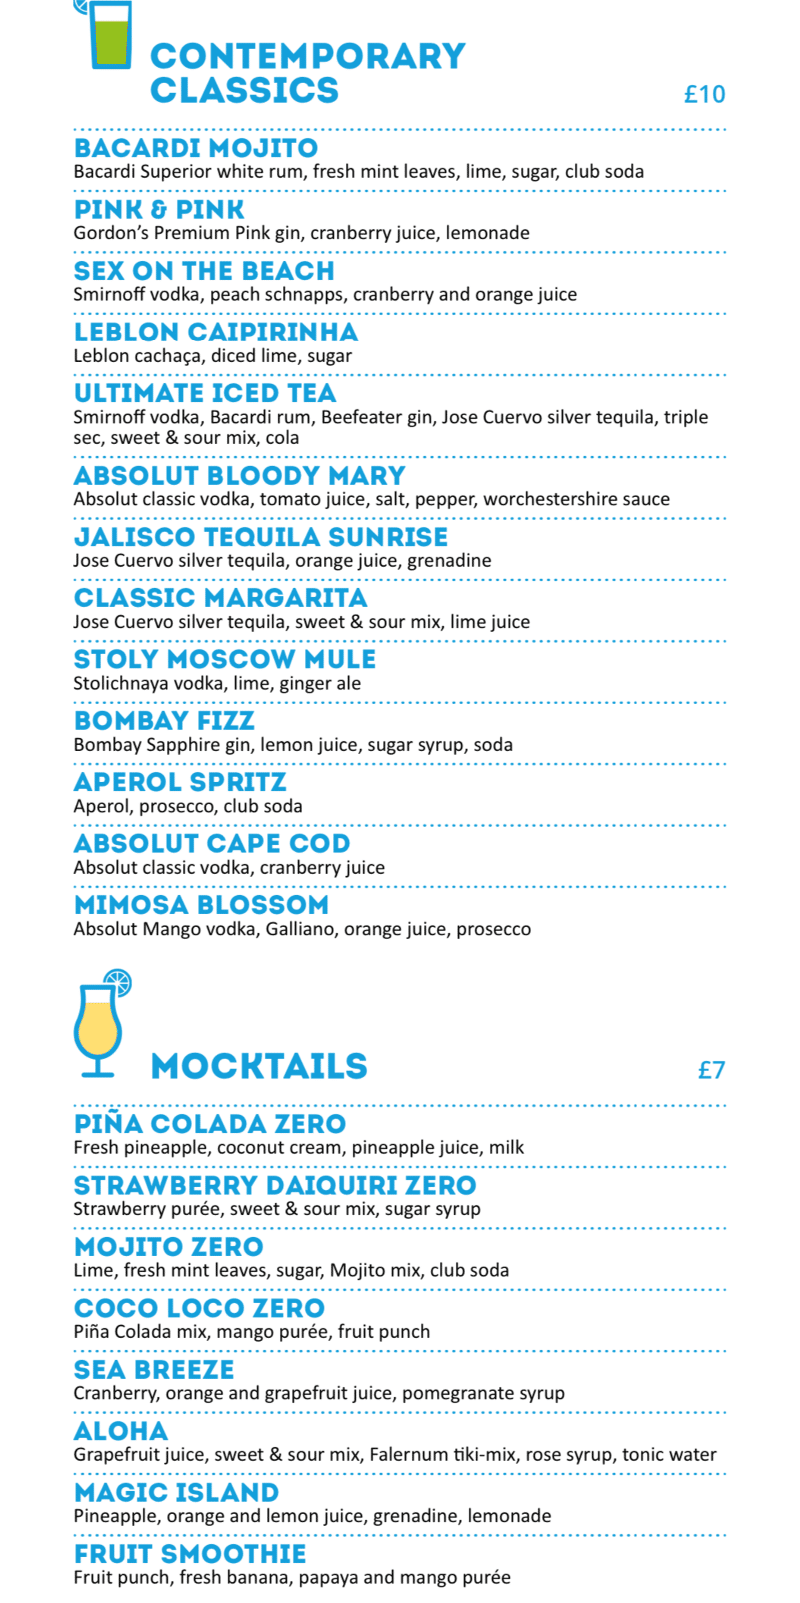 MSC Cruises Pool Bar mocktail menu